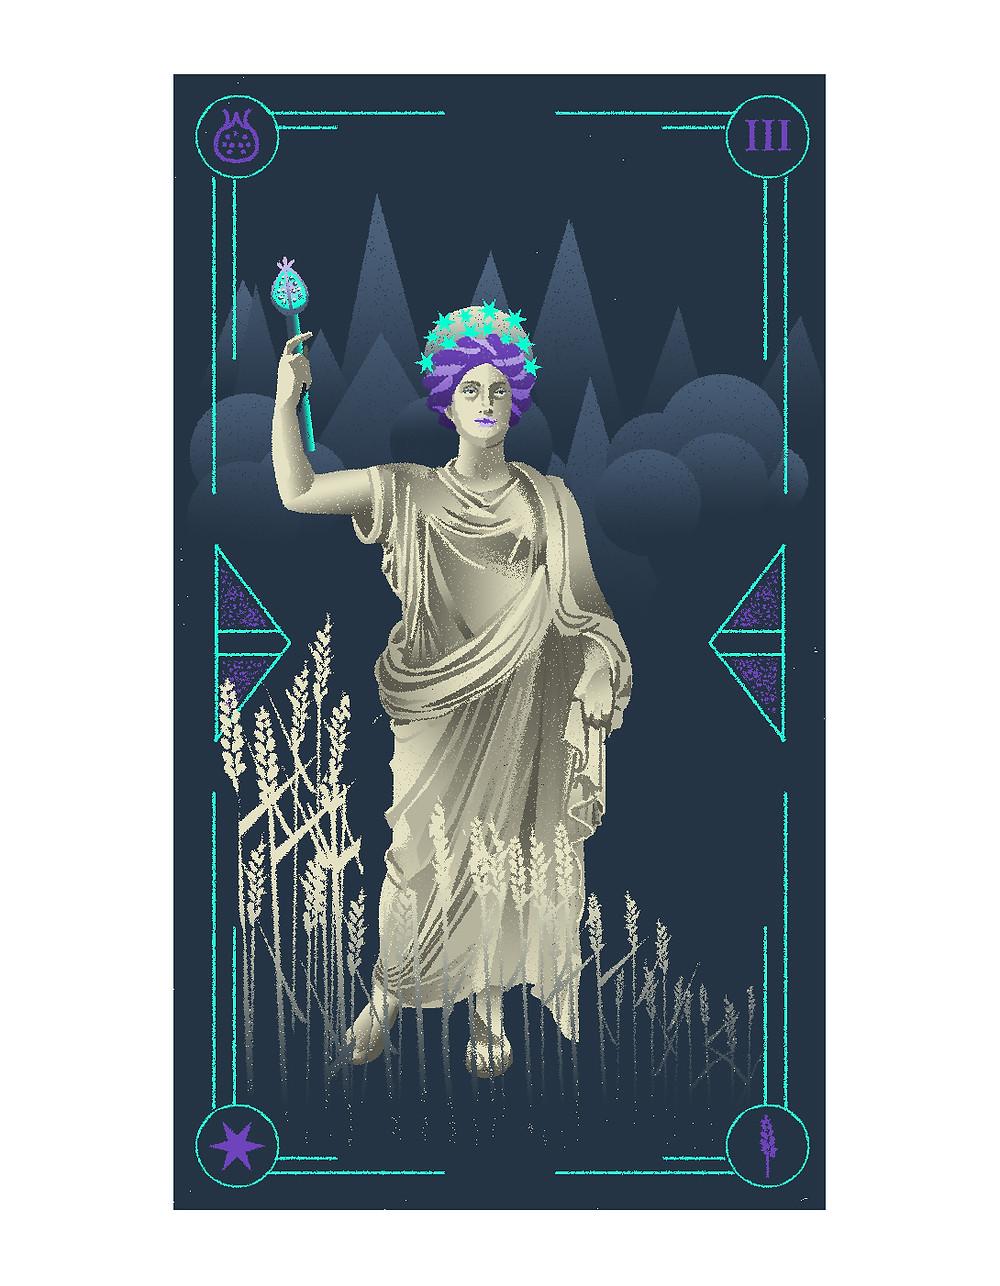 the empress card tarot illustrated tarot italian tarot illustrated major arcana alexandra wong illustration